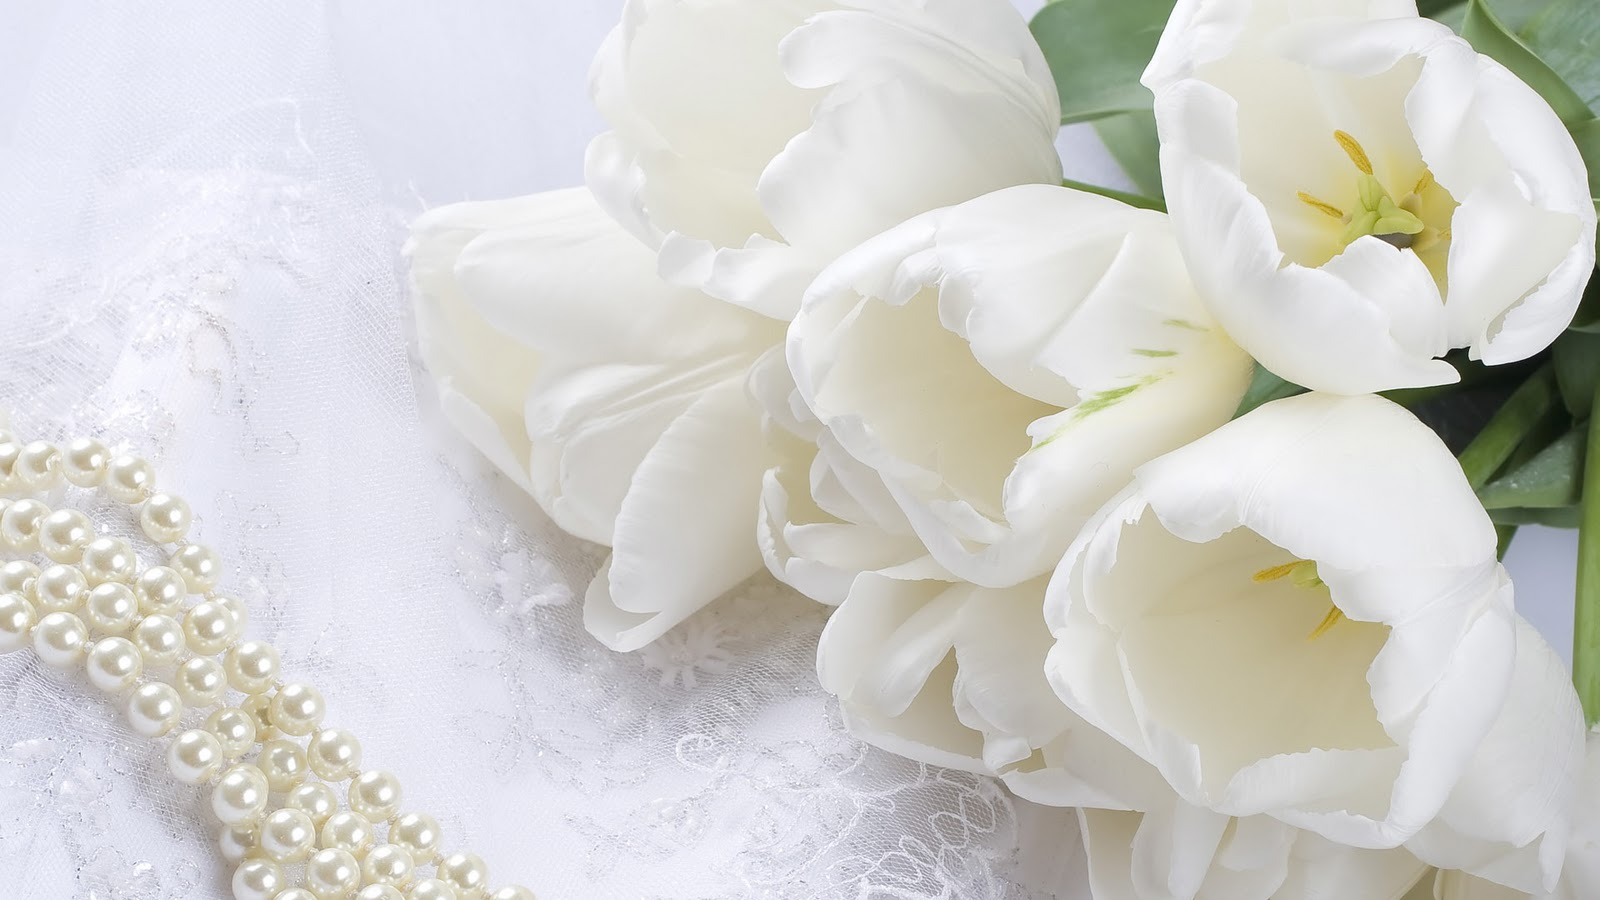 Zeeshan news most beautiful flower hd wallpaper izmirmasajfo